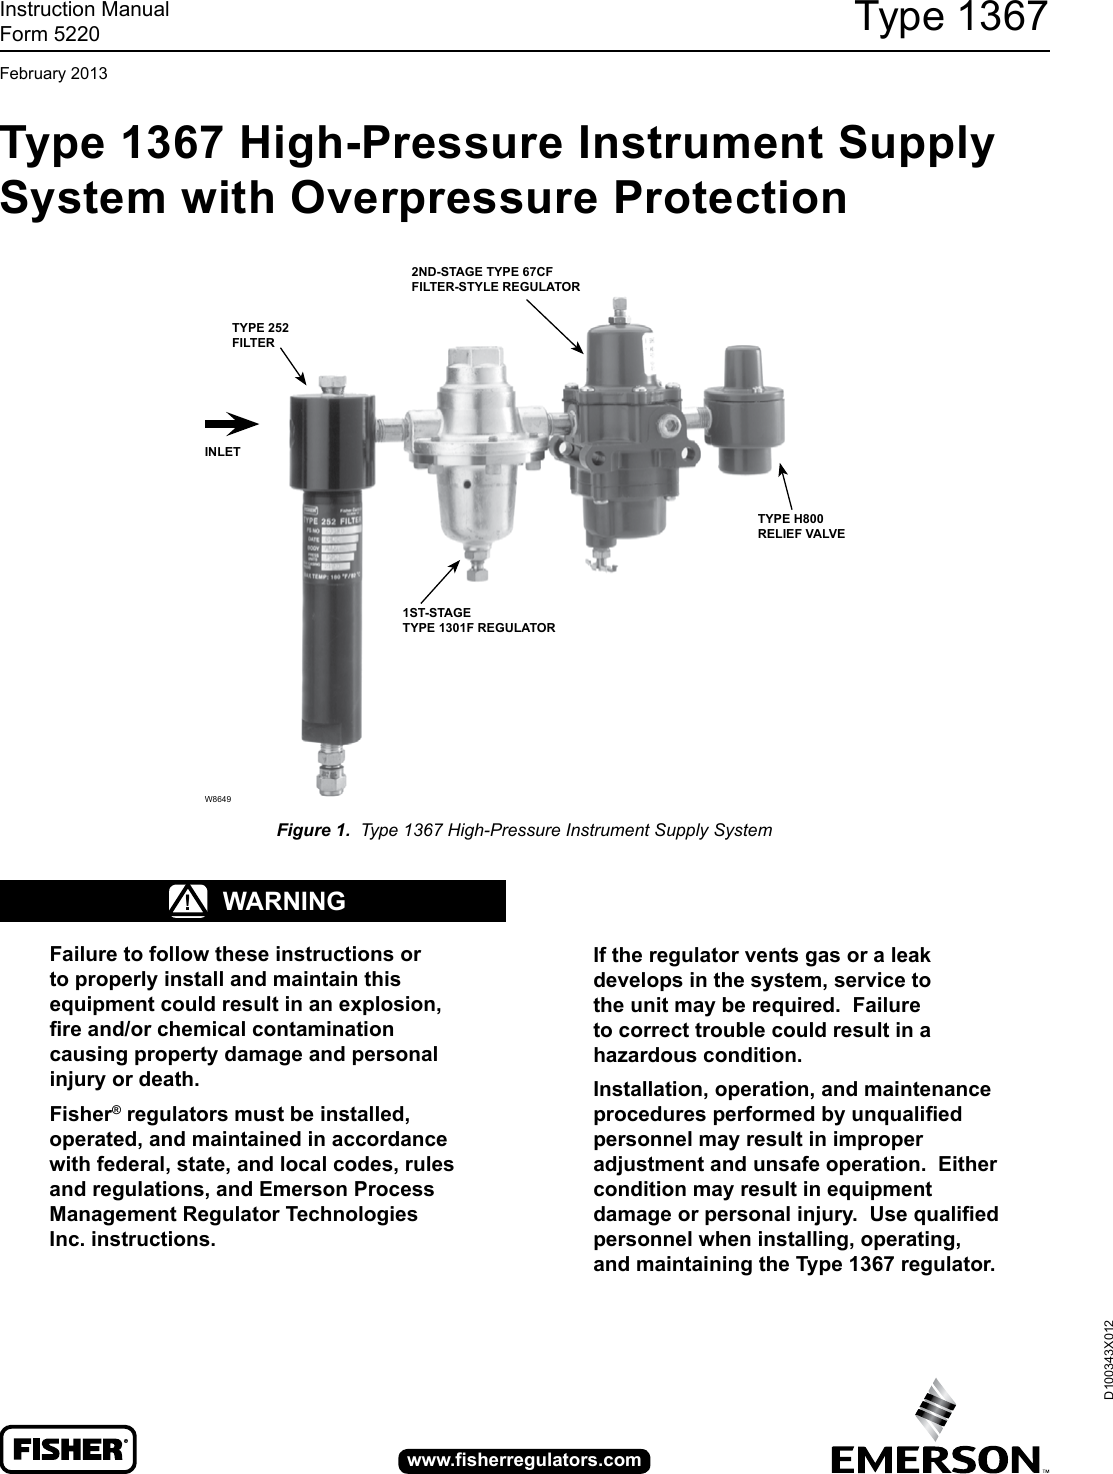 Emerson 1367 High Pressure Instrument Supply System